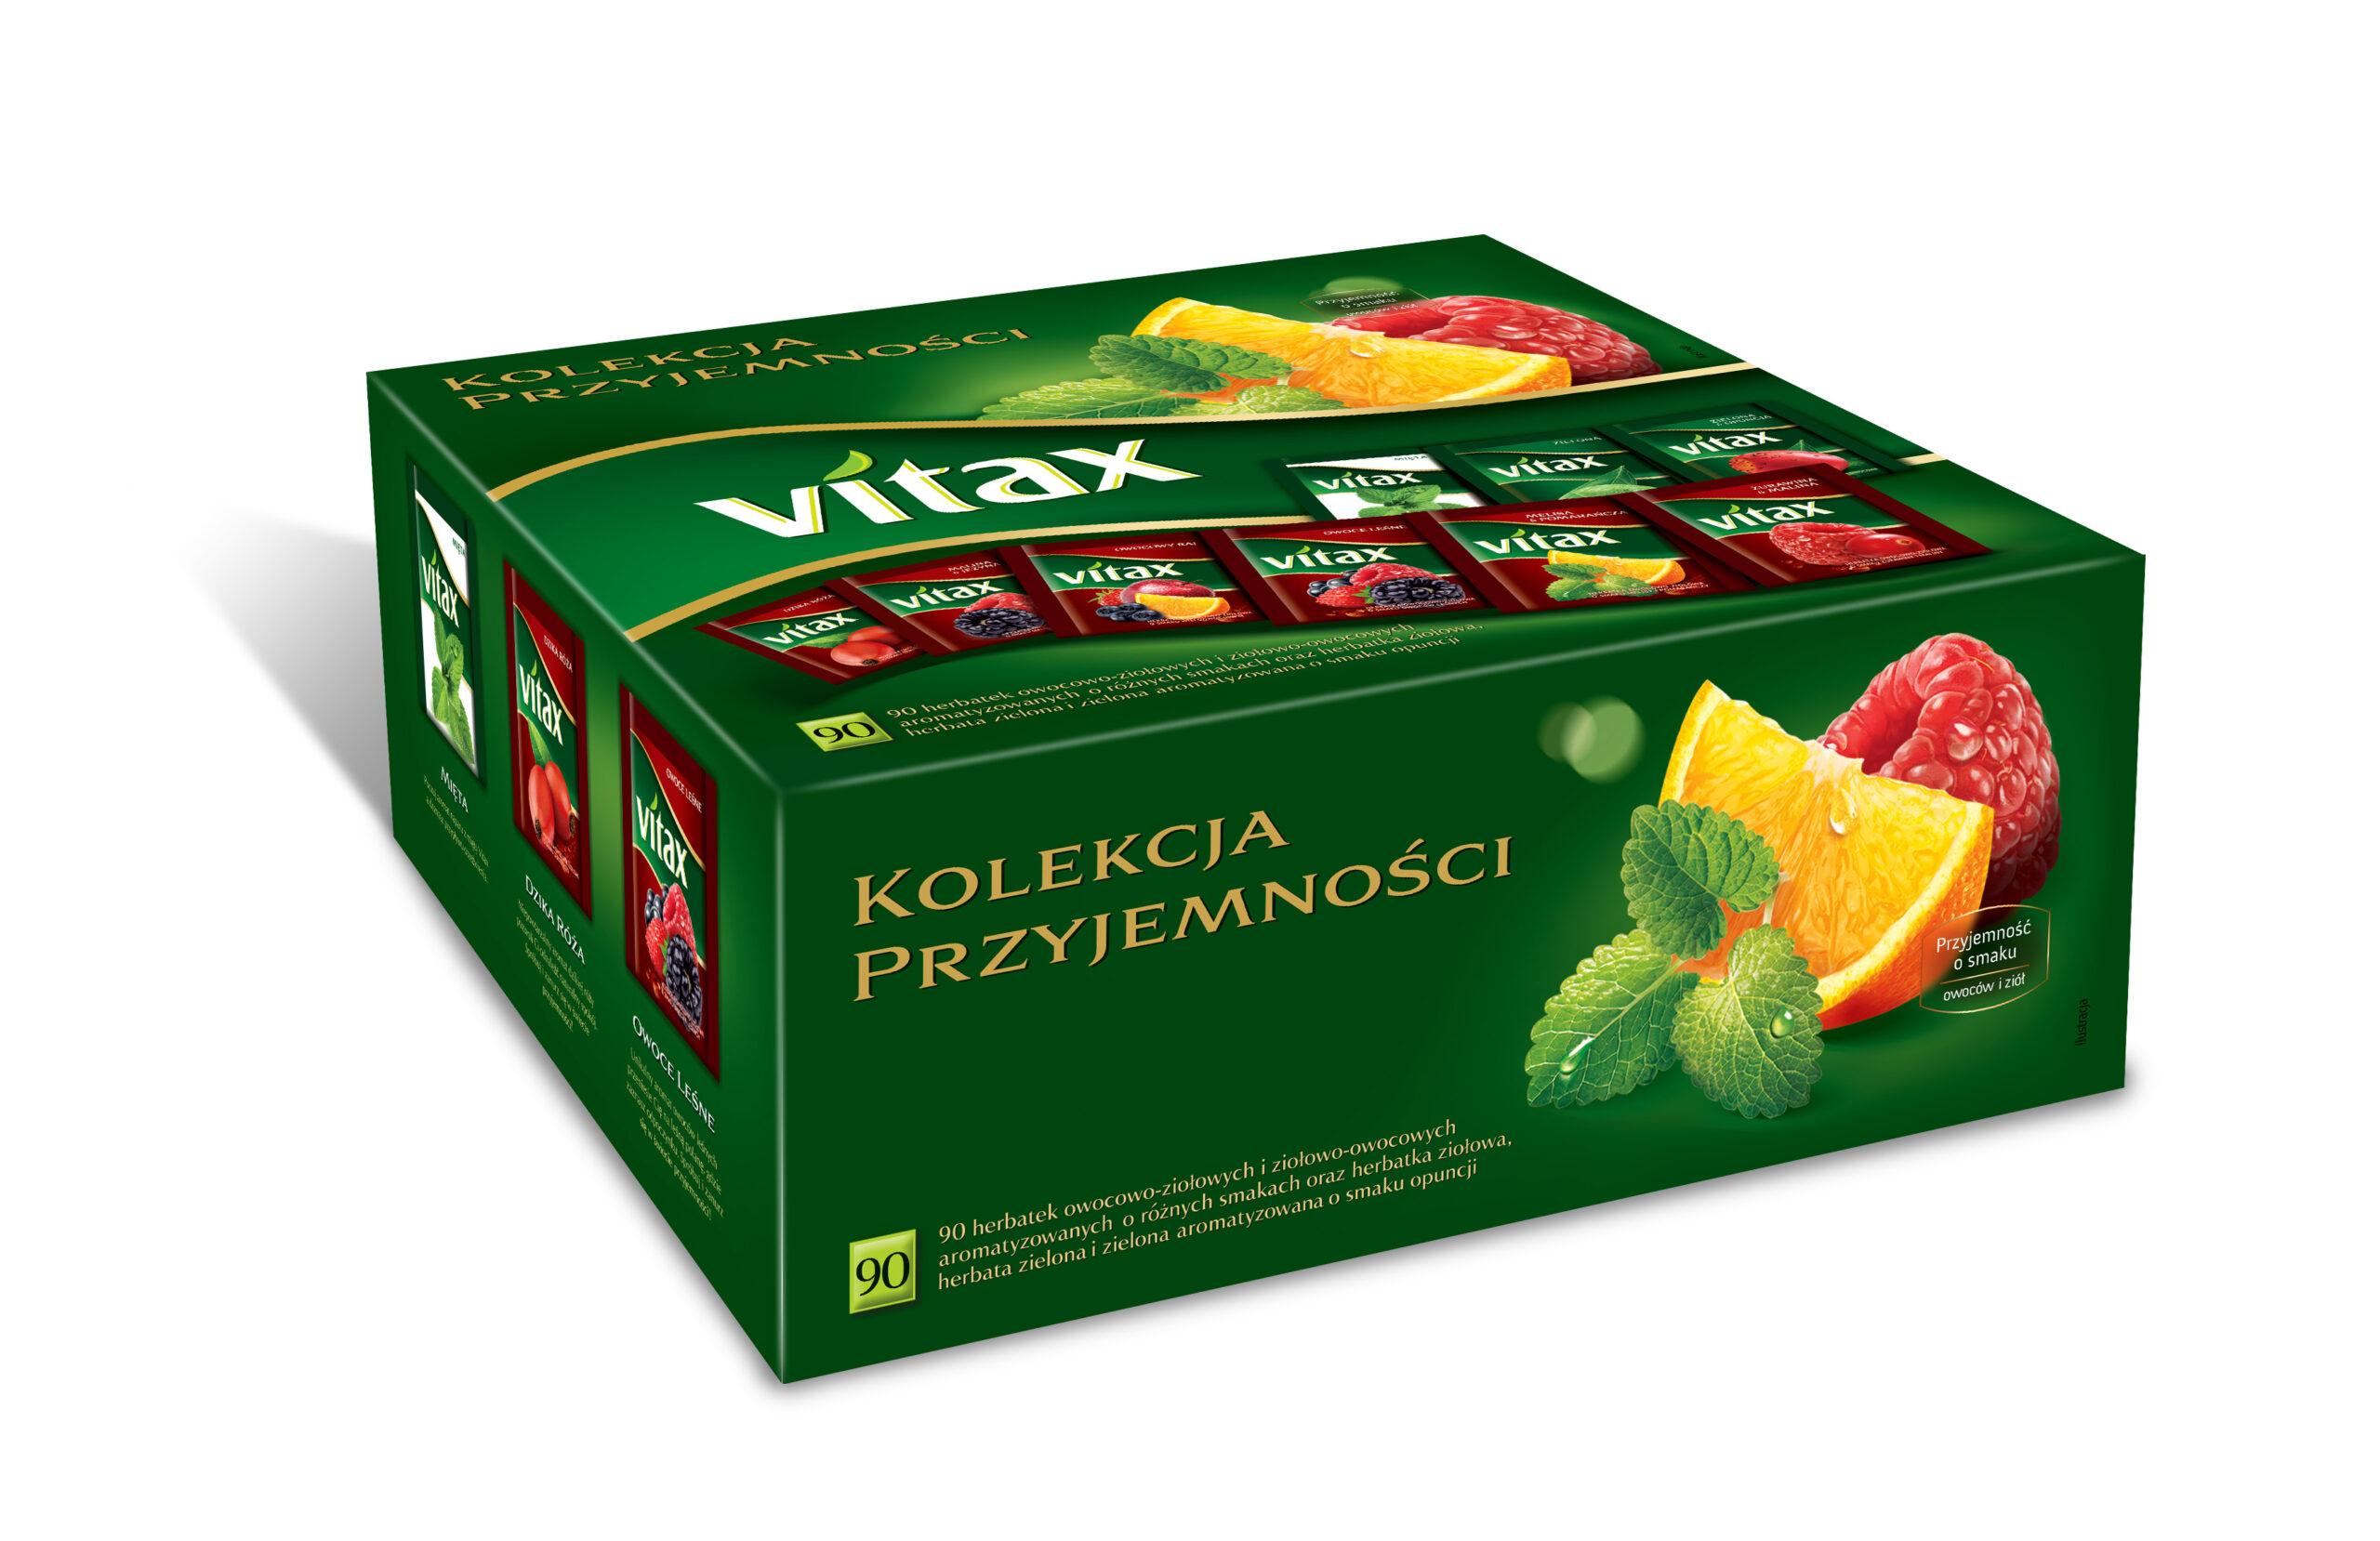 VITAX KARTON ZAMKNIETY